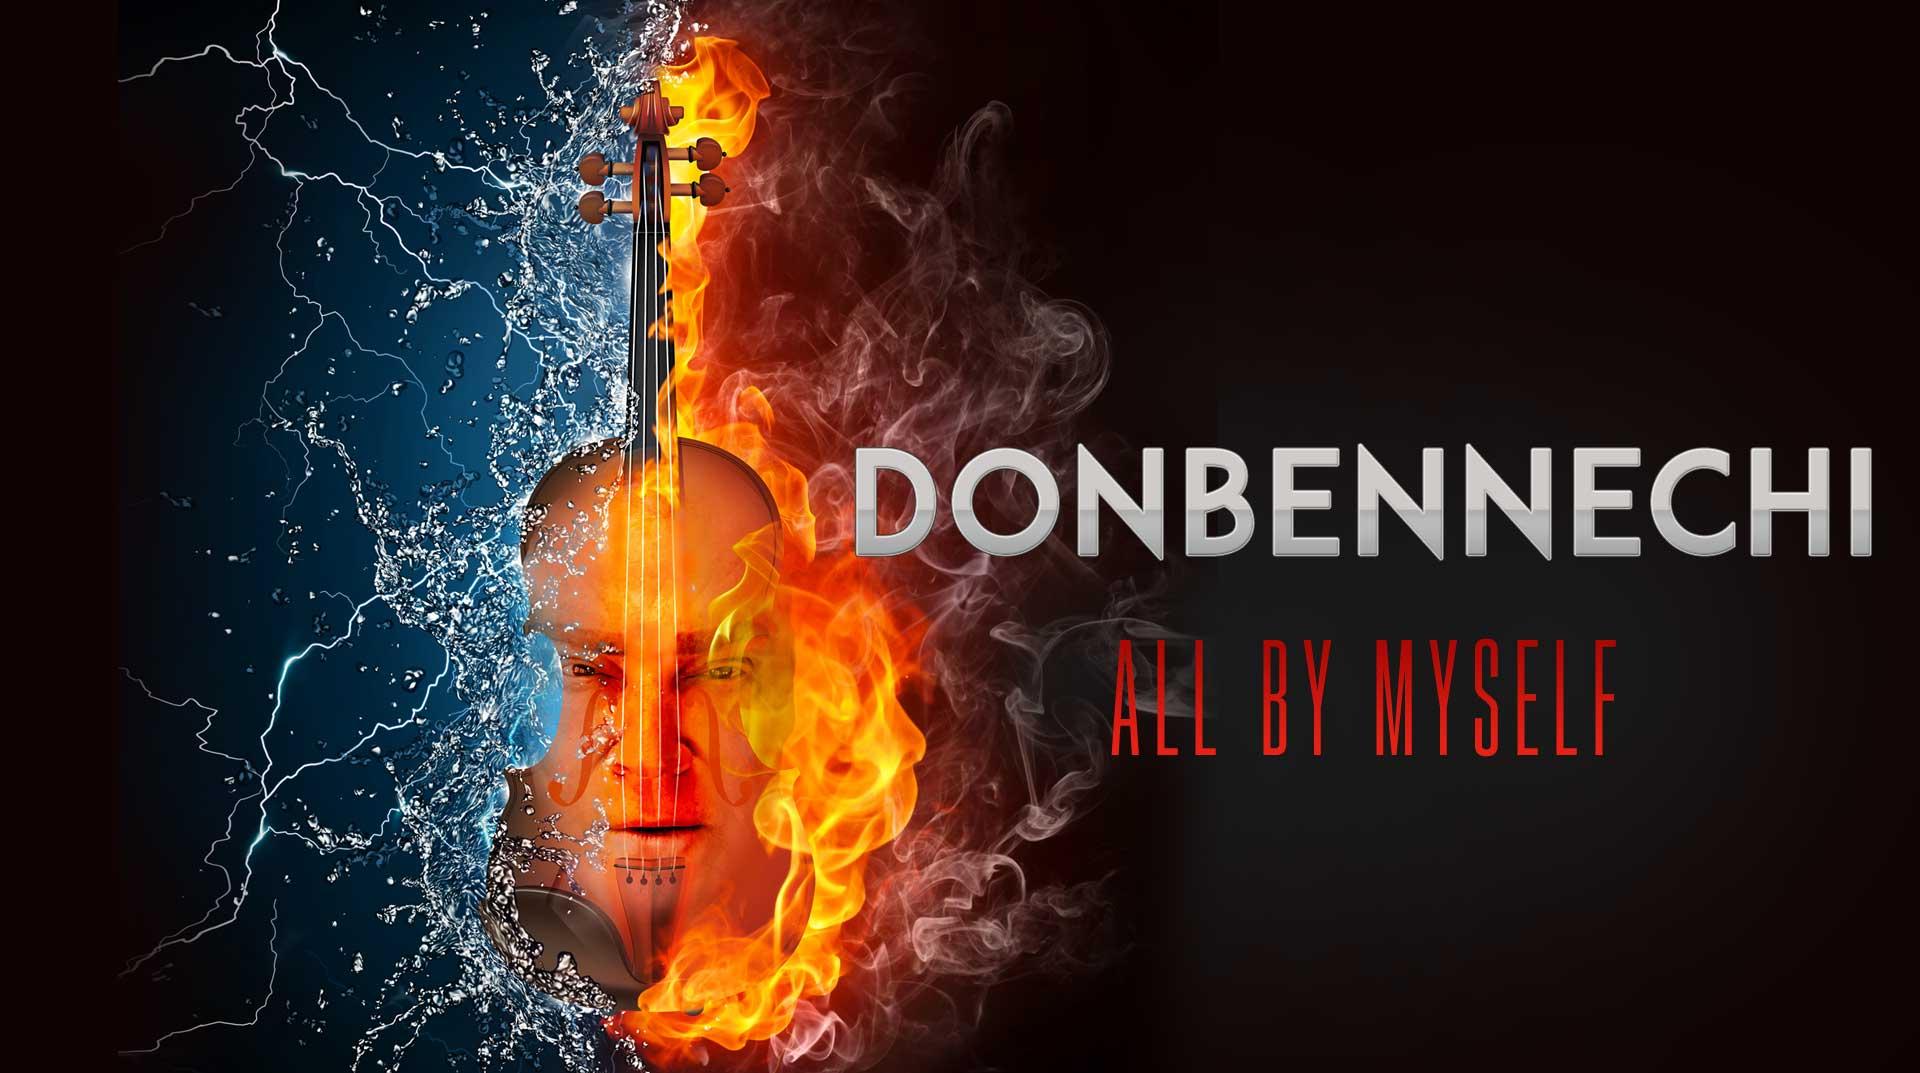 Don Bennechi